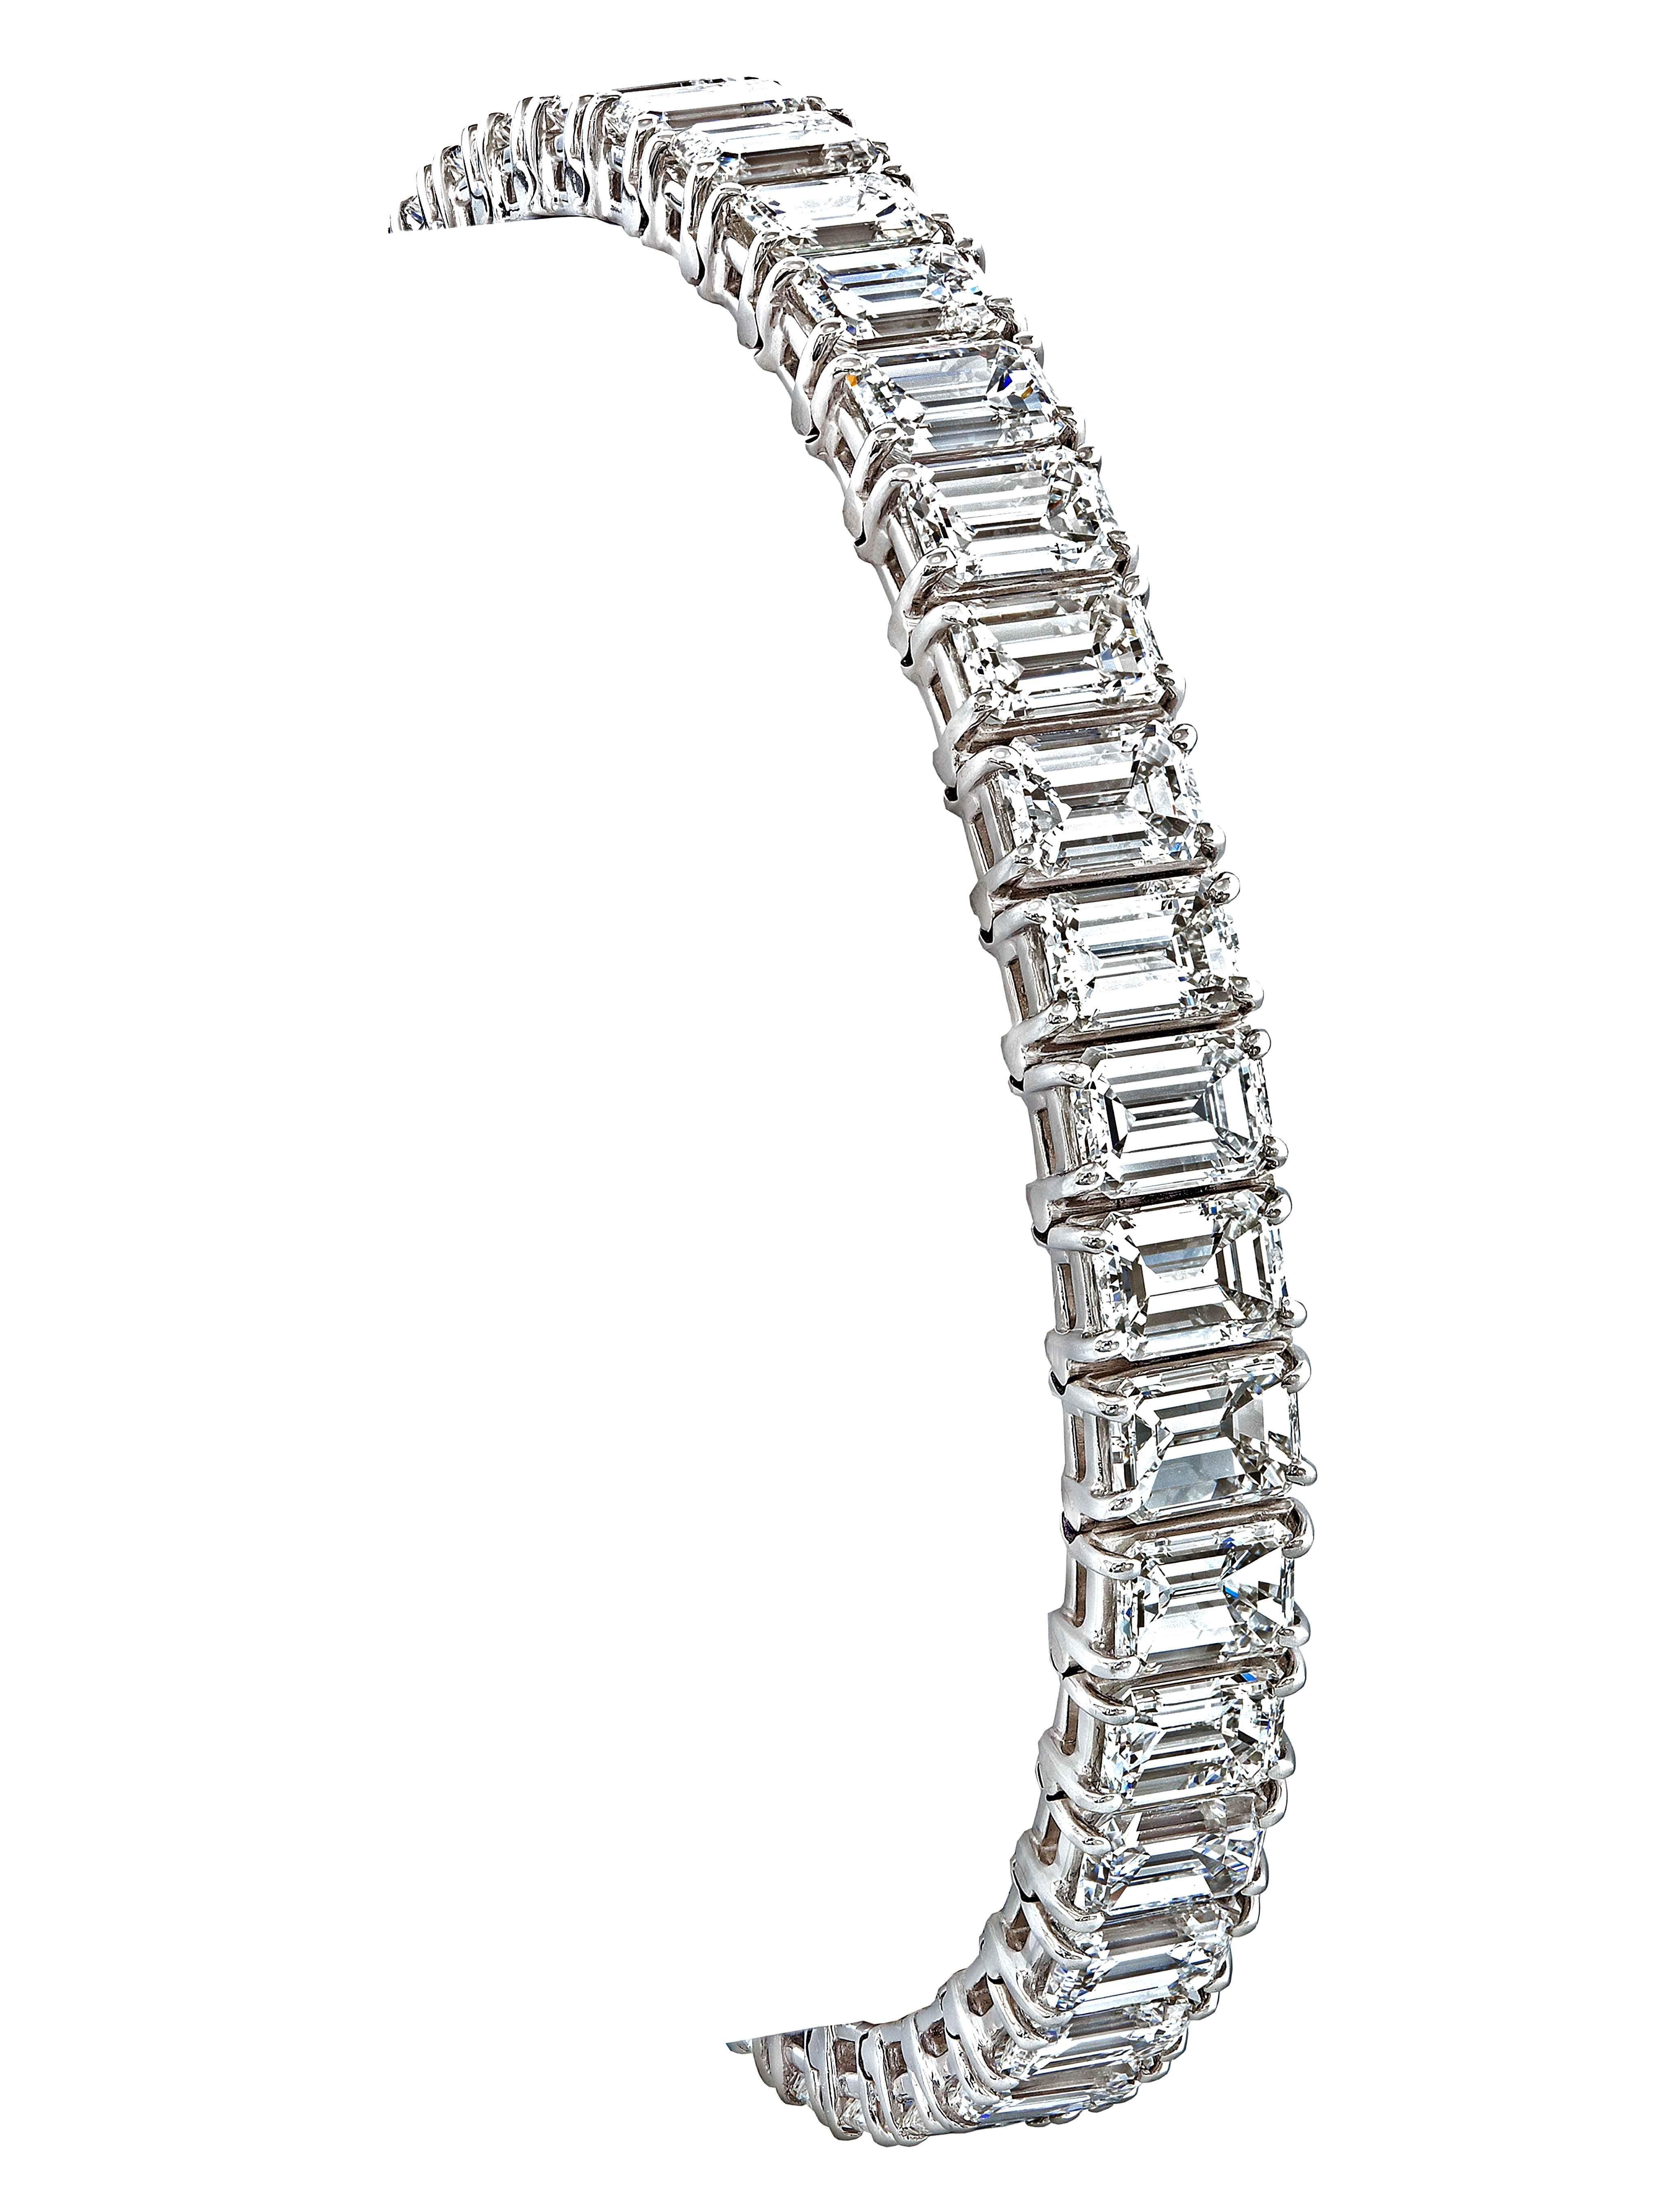 Home Gordon James Fine Diamonds Modern Jewelry Sterling Bracelets Rare Gemstones